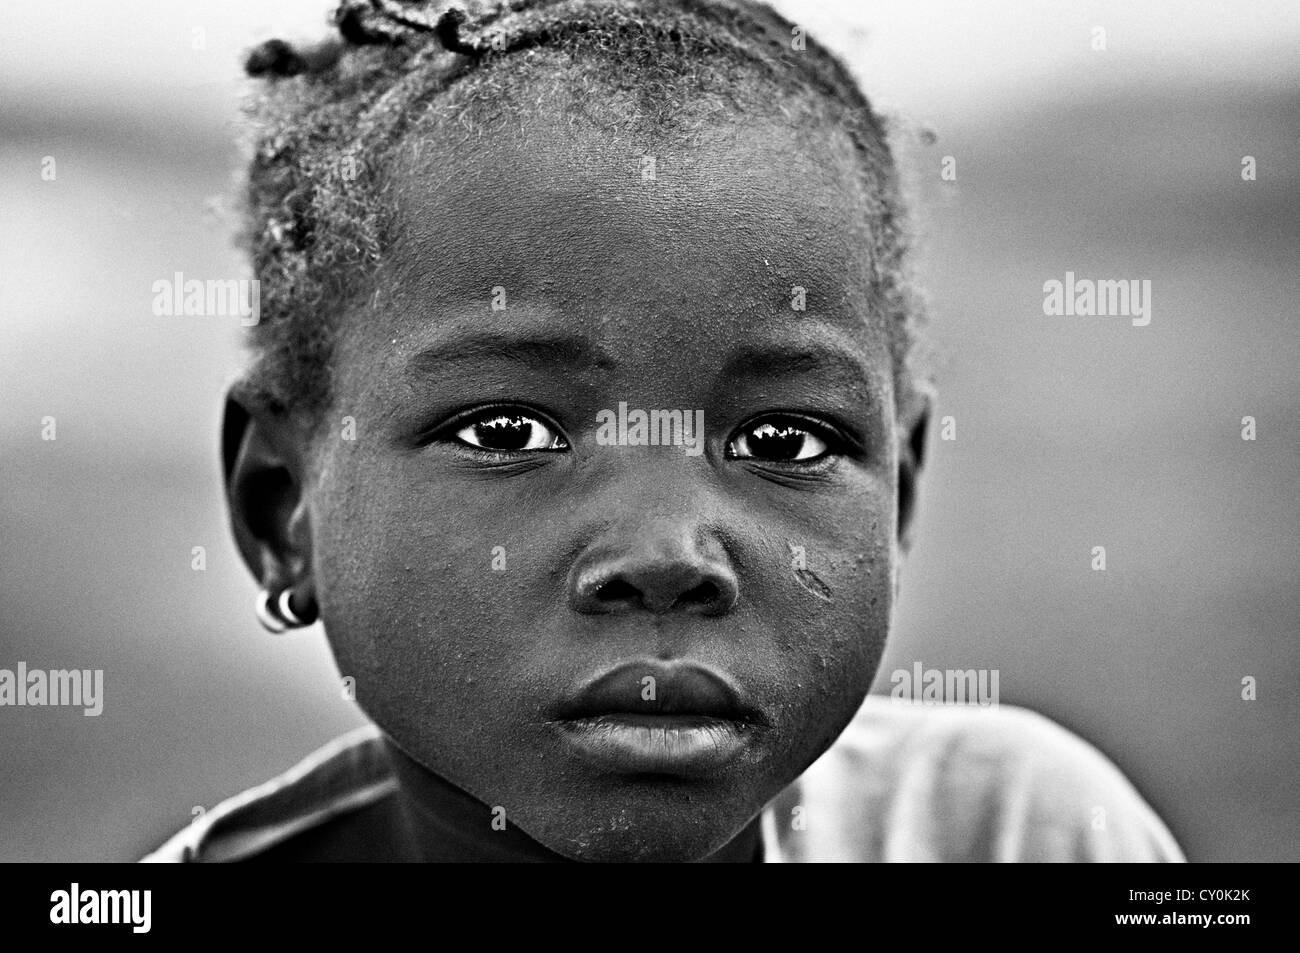 Portrait of a burkinabe girl. Burkina Faso - Stock Image